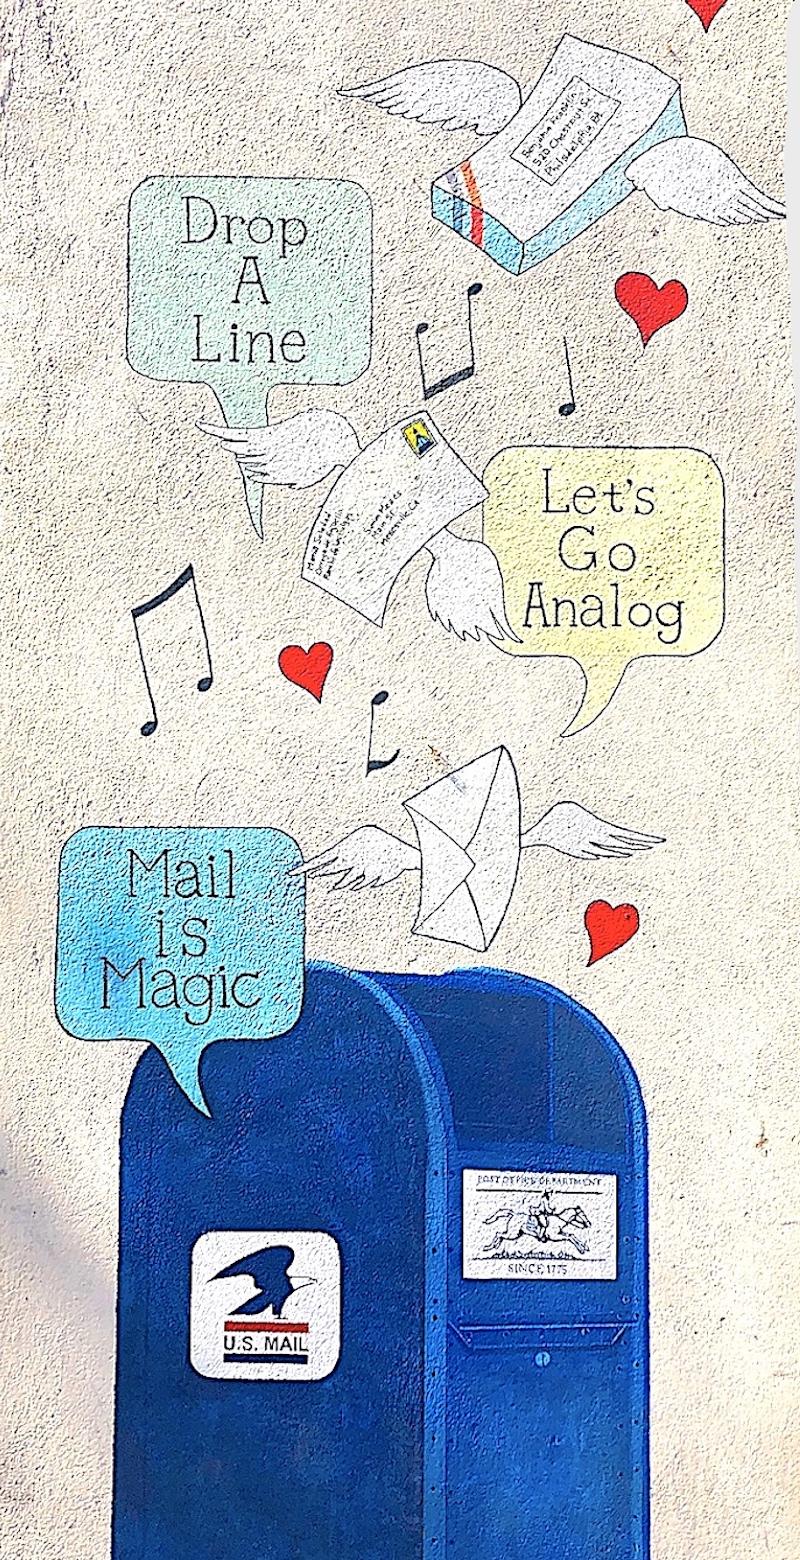 Mail - Go Analog